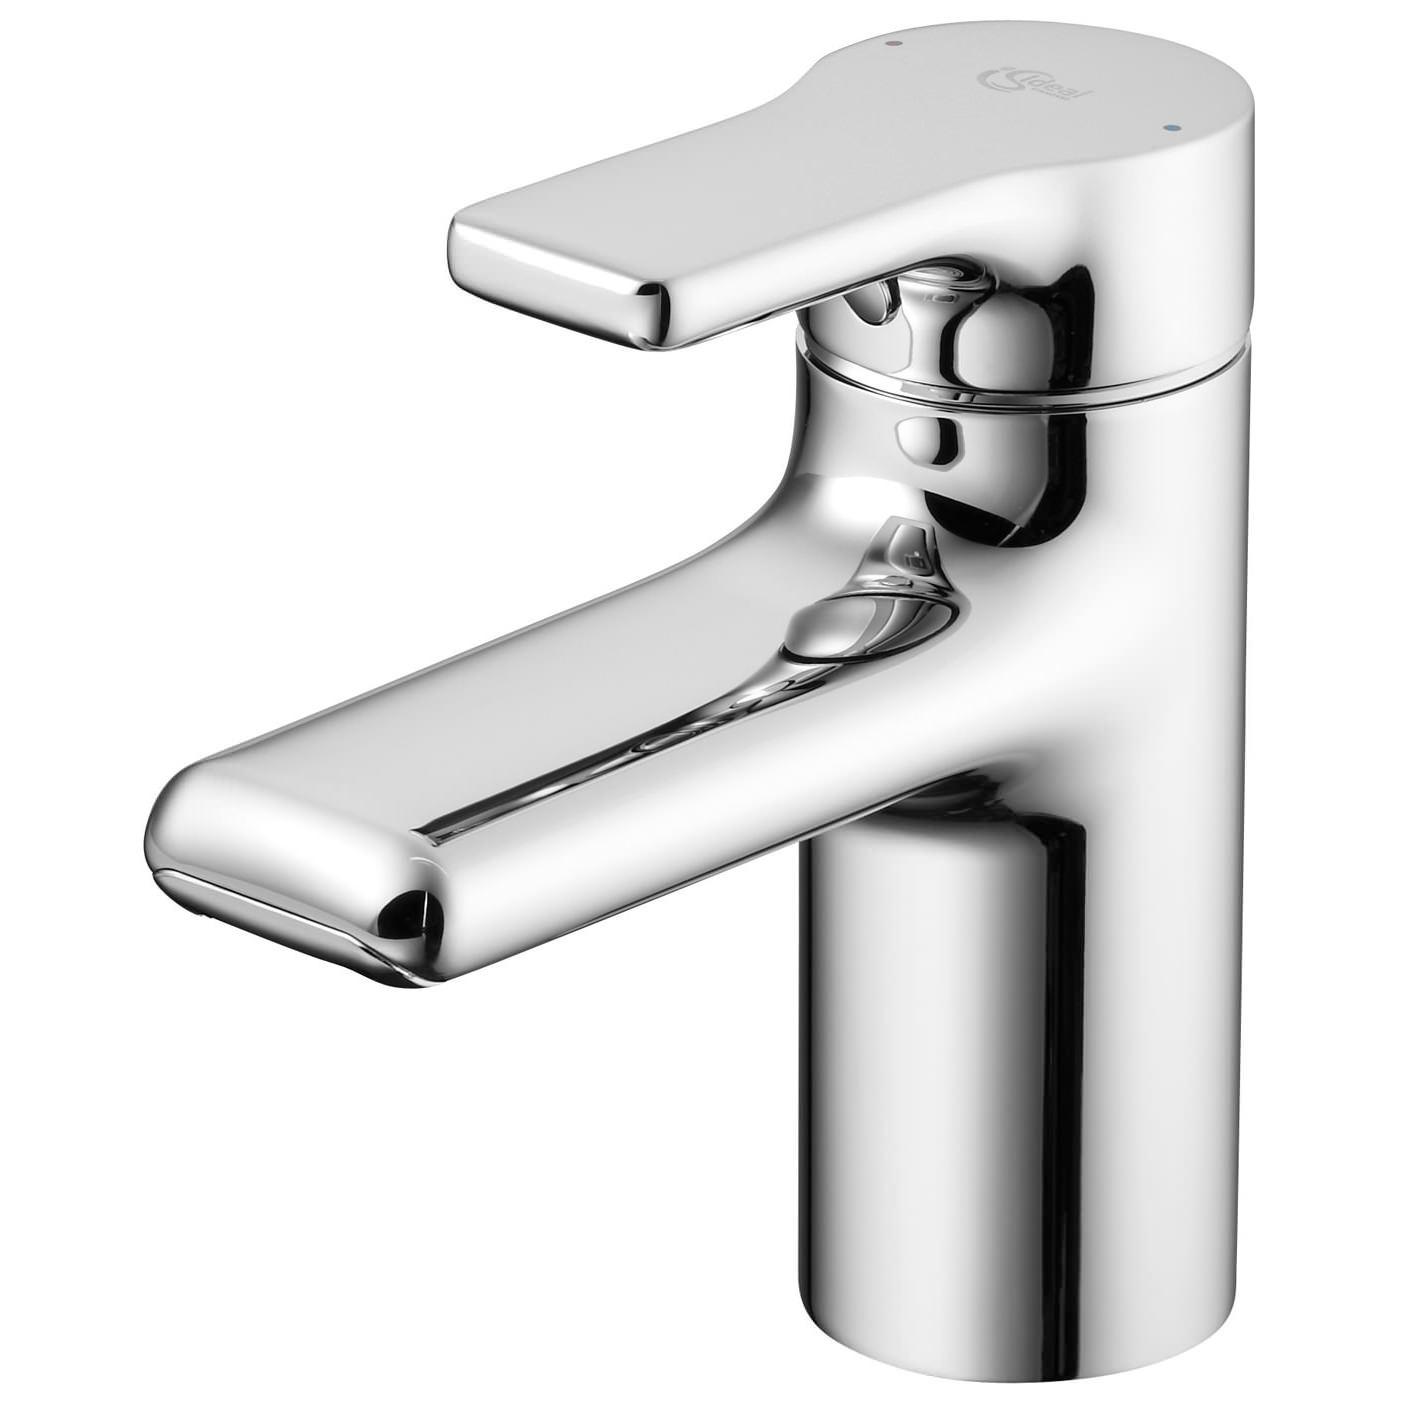 ideal standard attitude chrome plated basin mixer tap. Black Bedroom Furniture Sets. Home Design Ideas